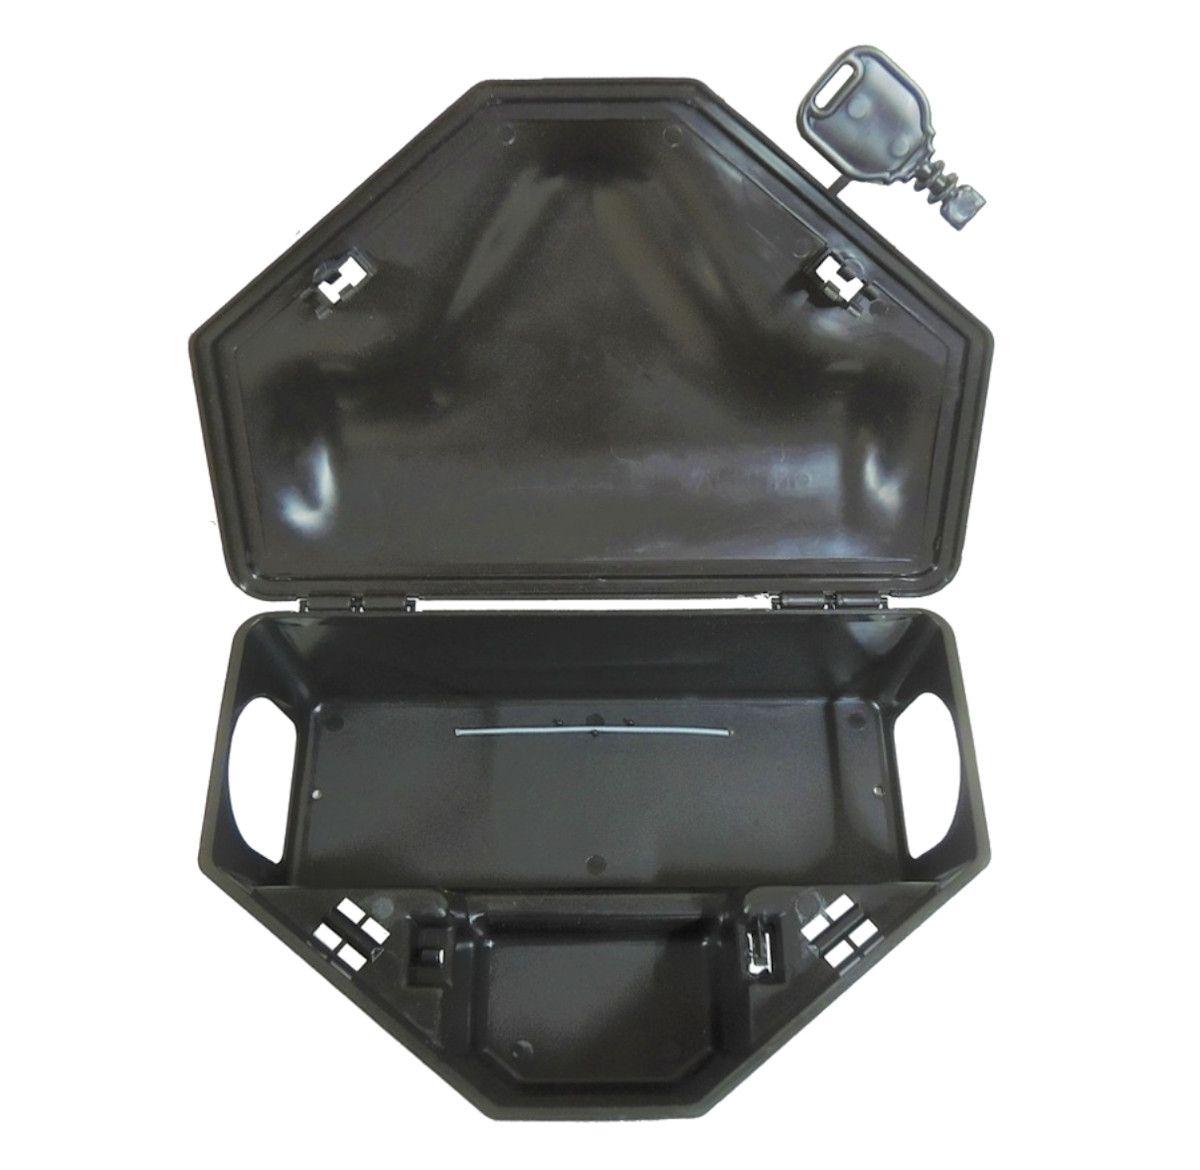 Kit 63 Porta Isca C/2 Chaves + 63 Bloco Extrusado Mata Seca